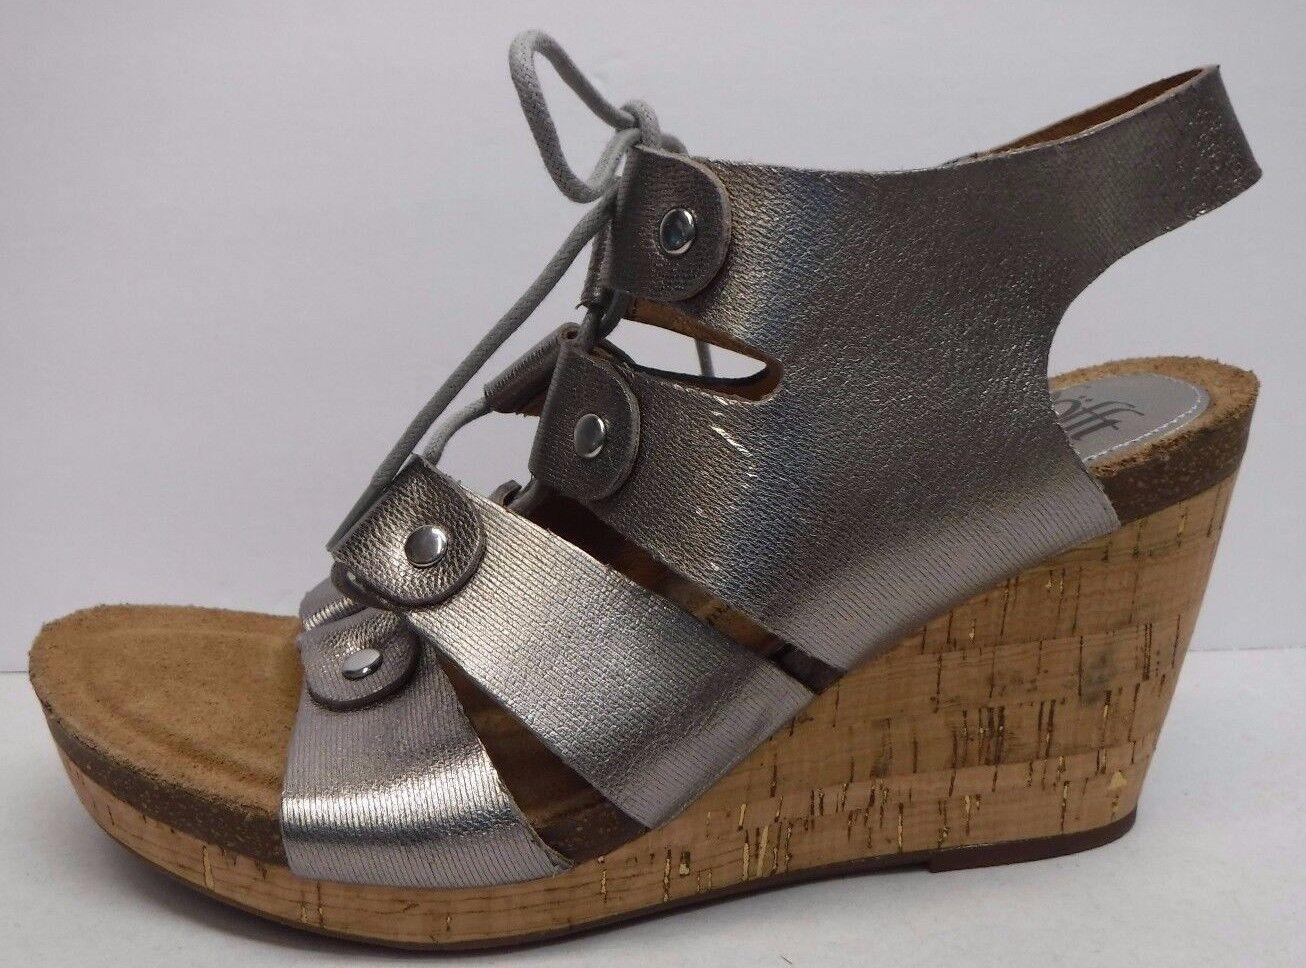 Sofft Größe 9.5 Pewter Leder Cork Wedge Heels NEU Damenschuhe Schuhes